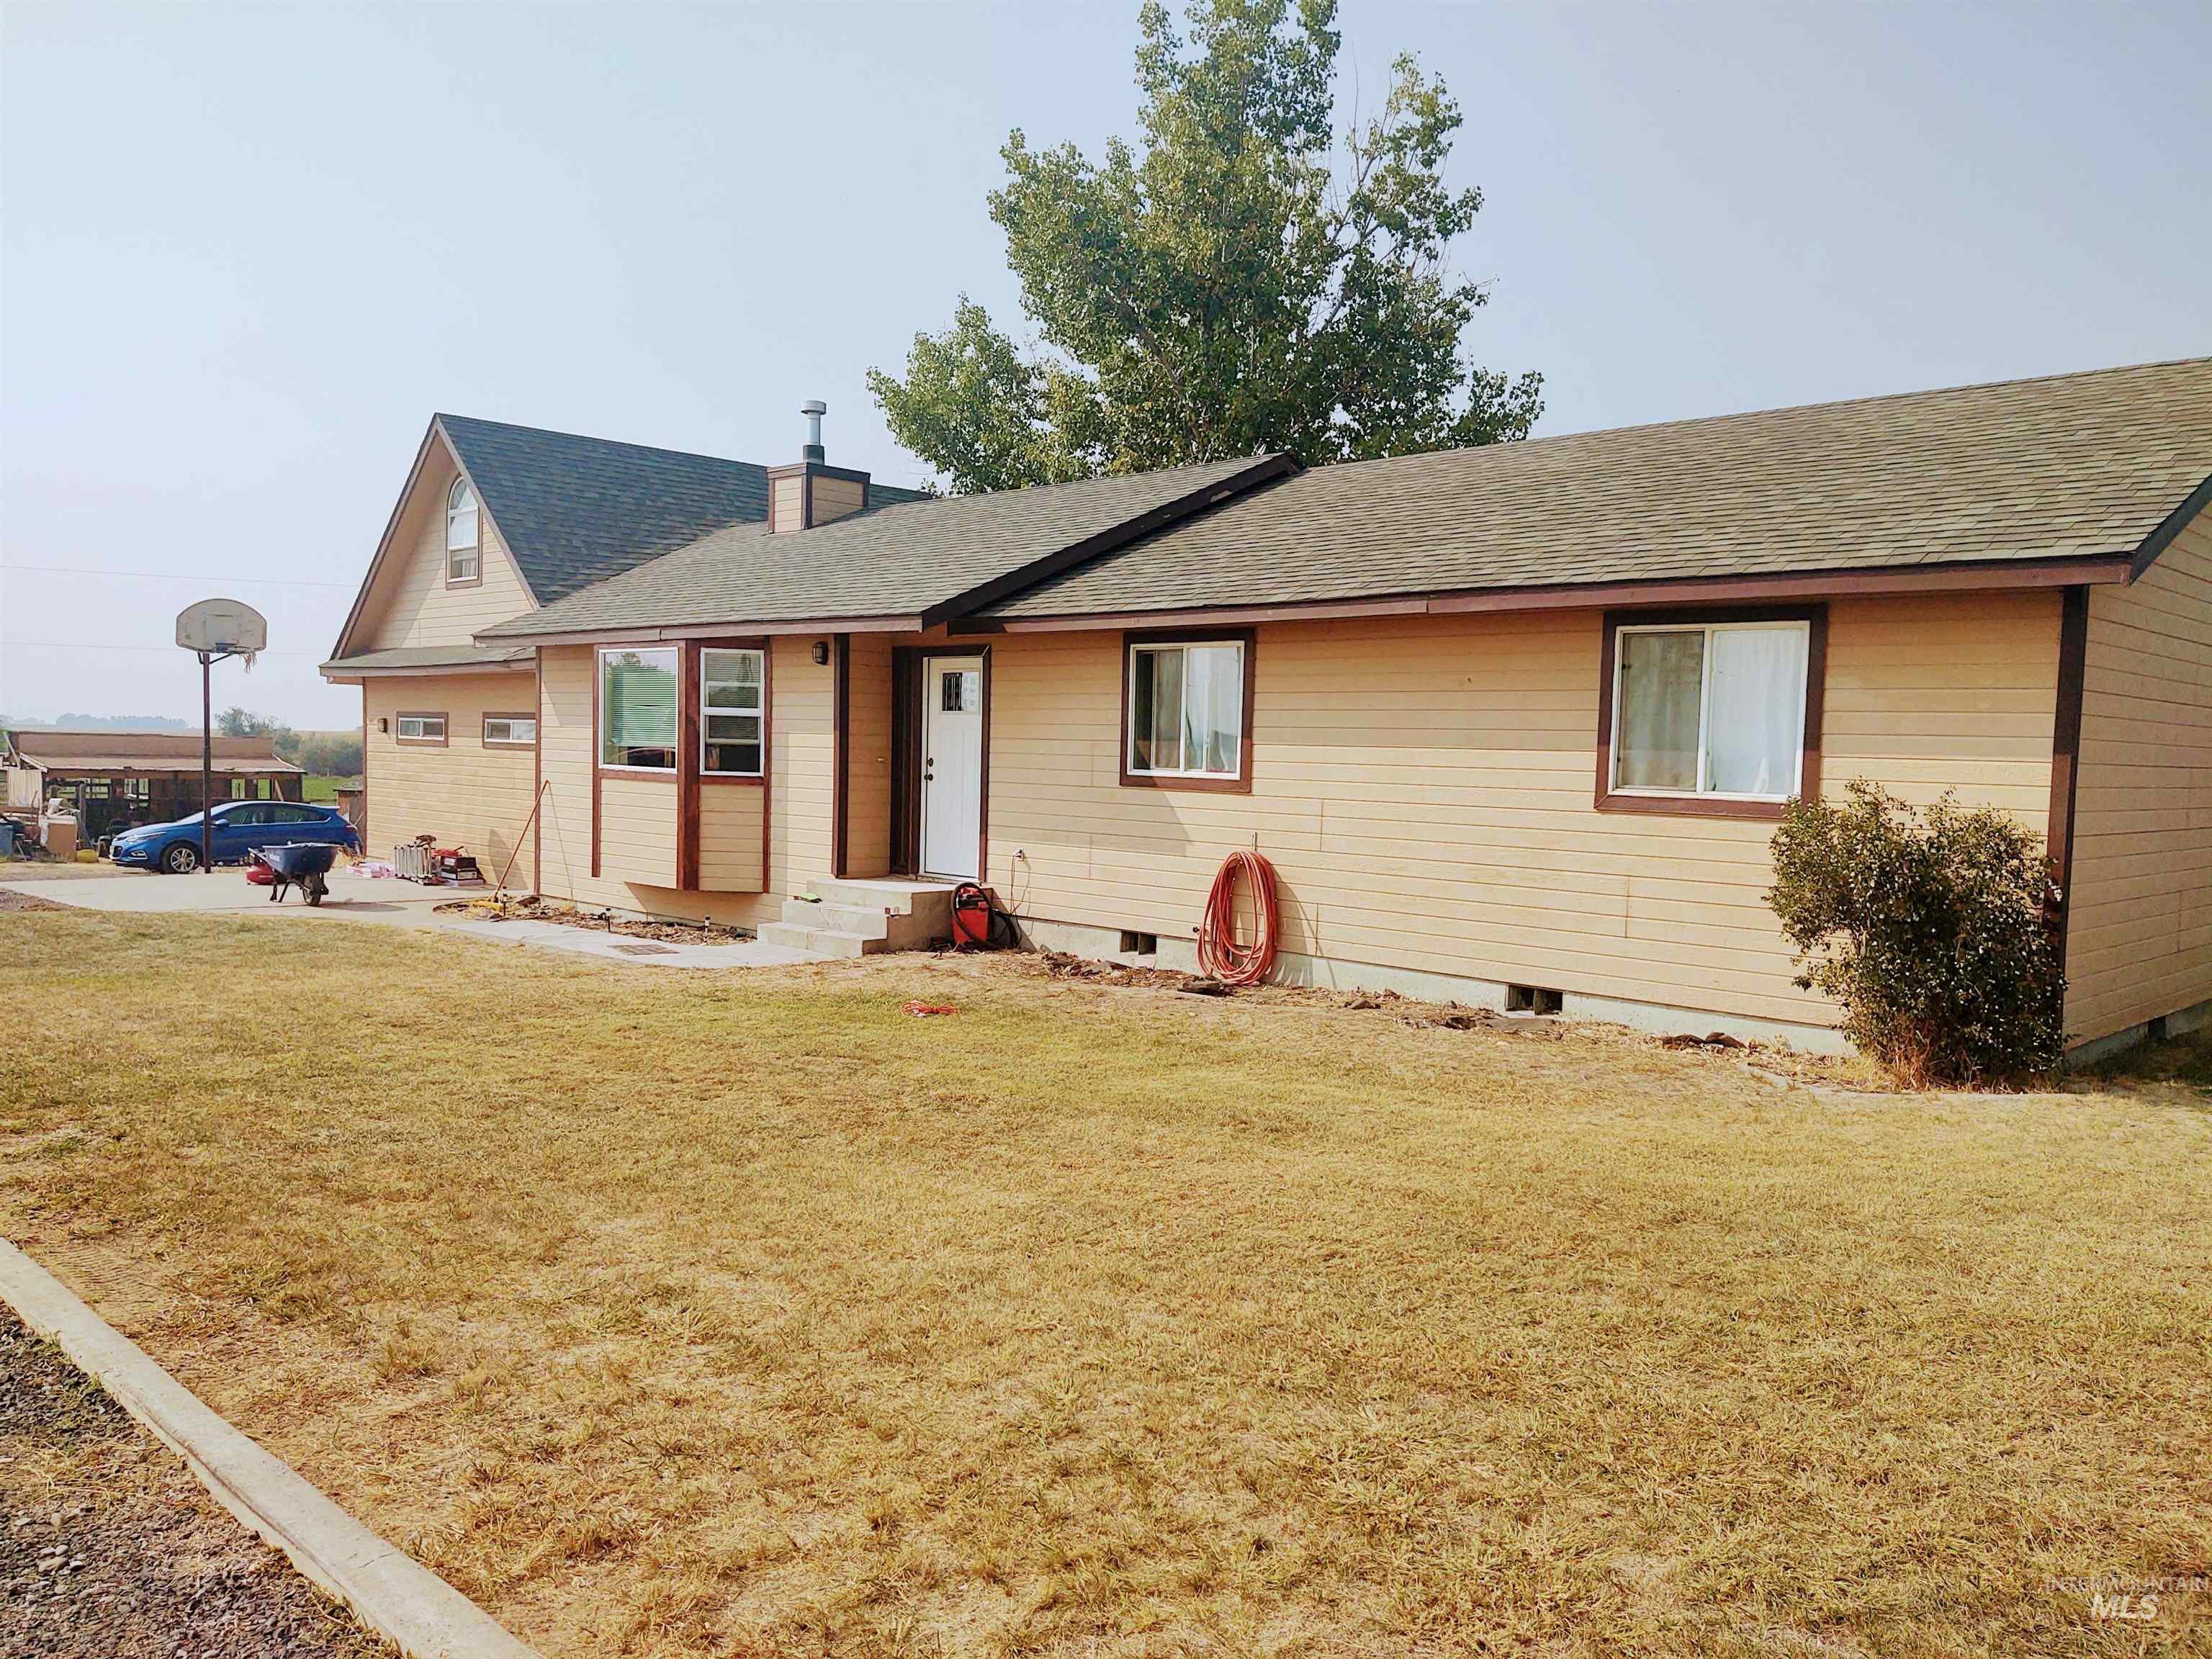 489 S 138 W Road Property Photo 1